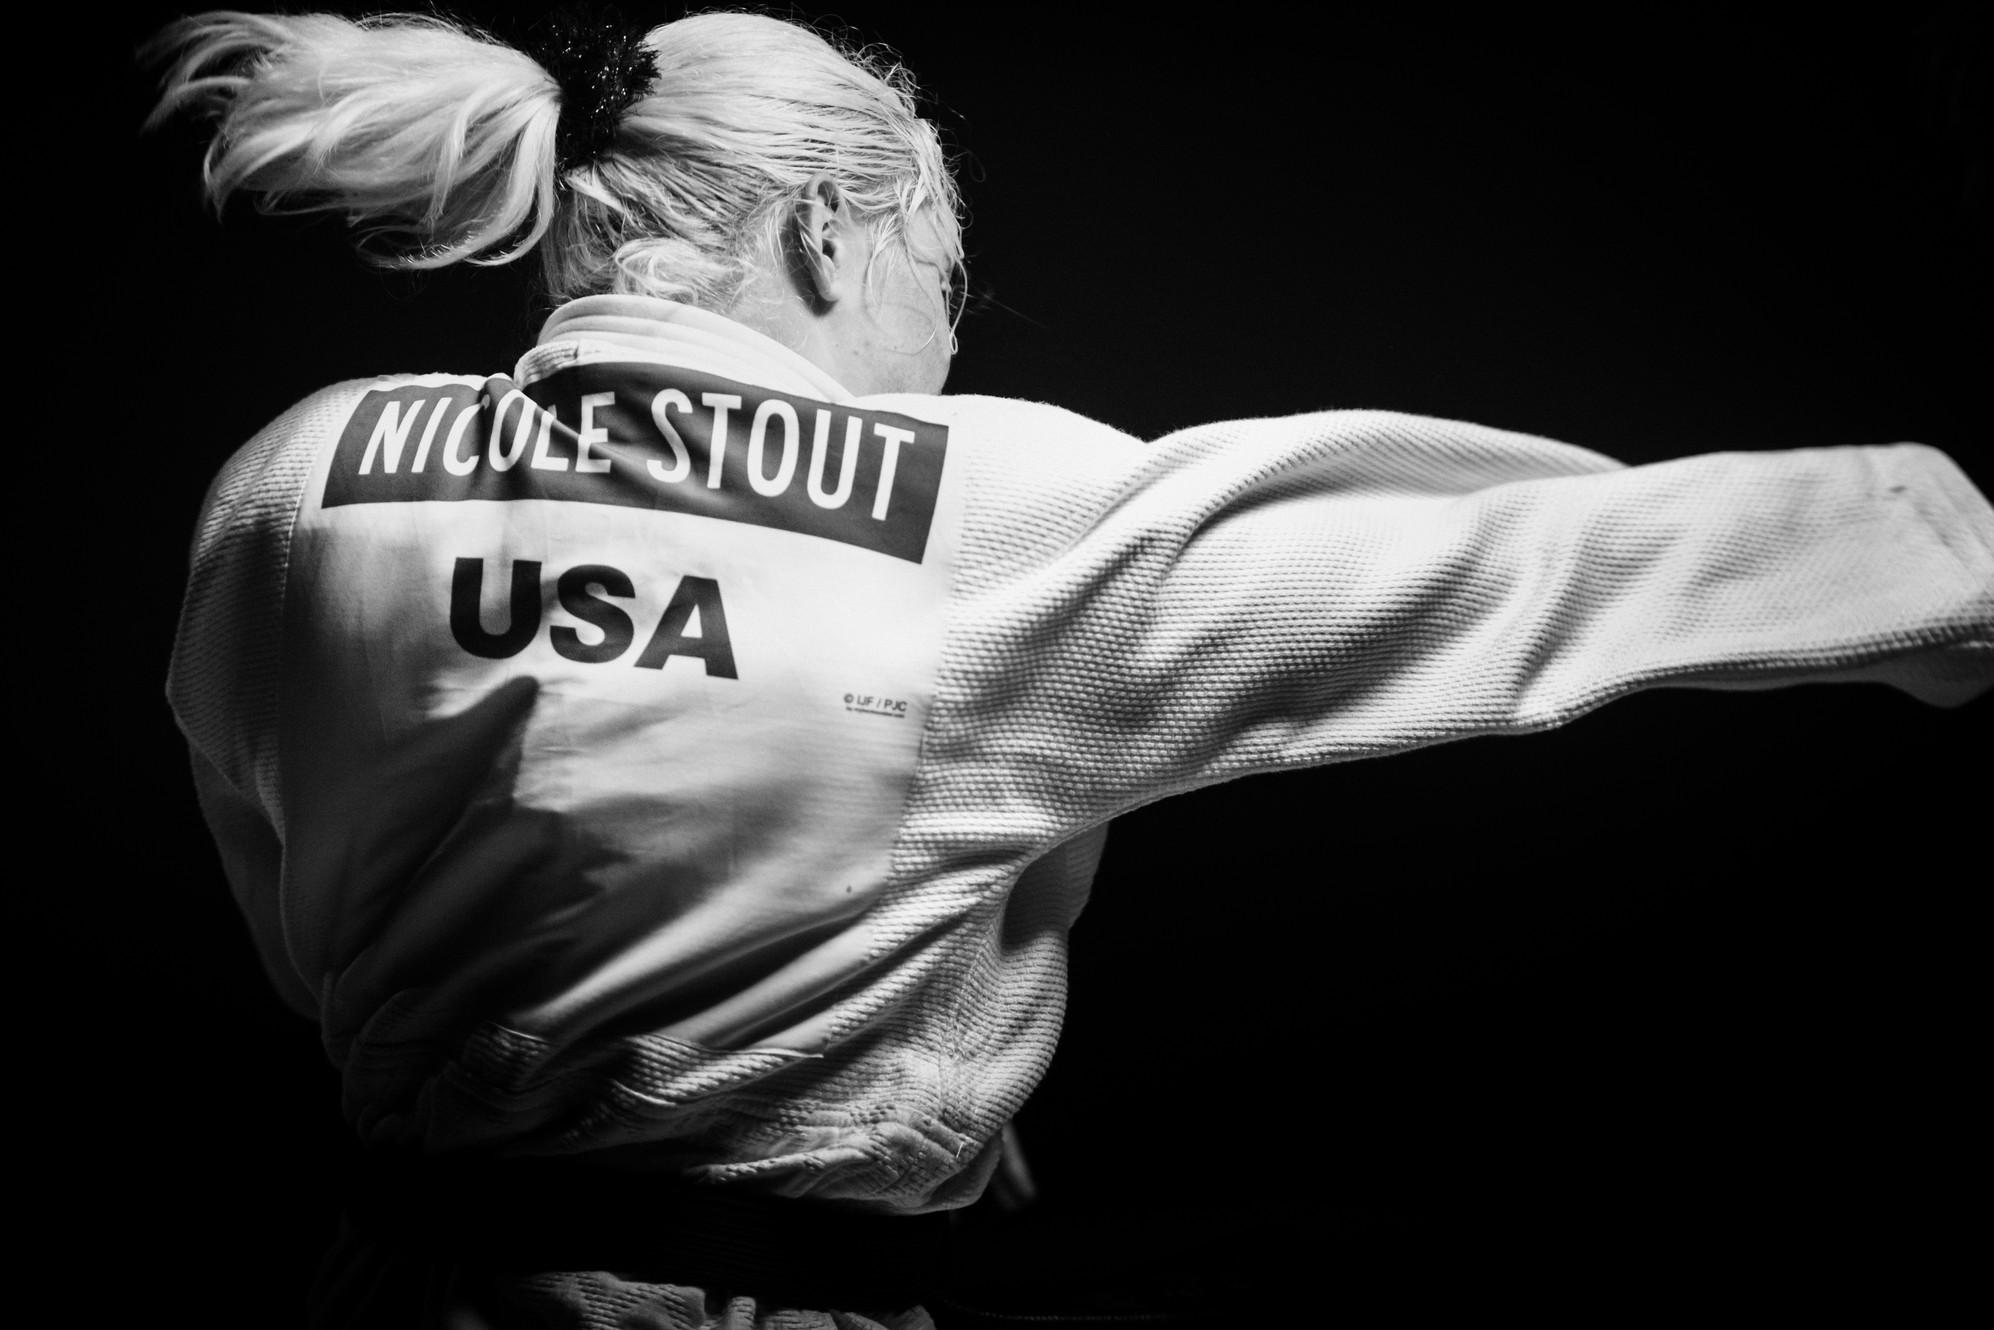 Accolades   Judo   Nicole Stout